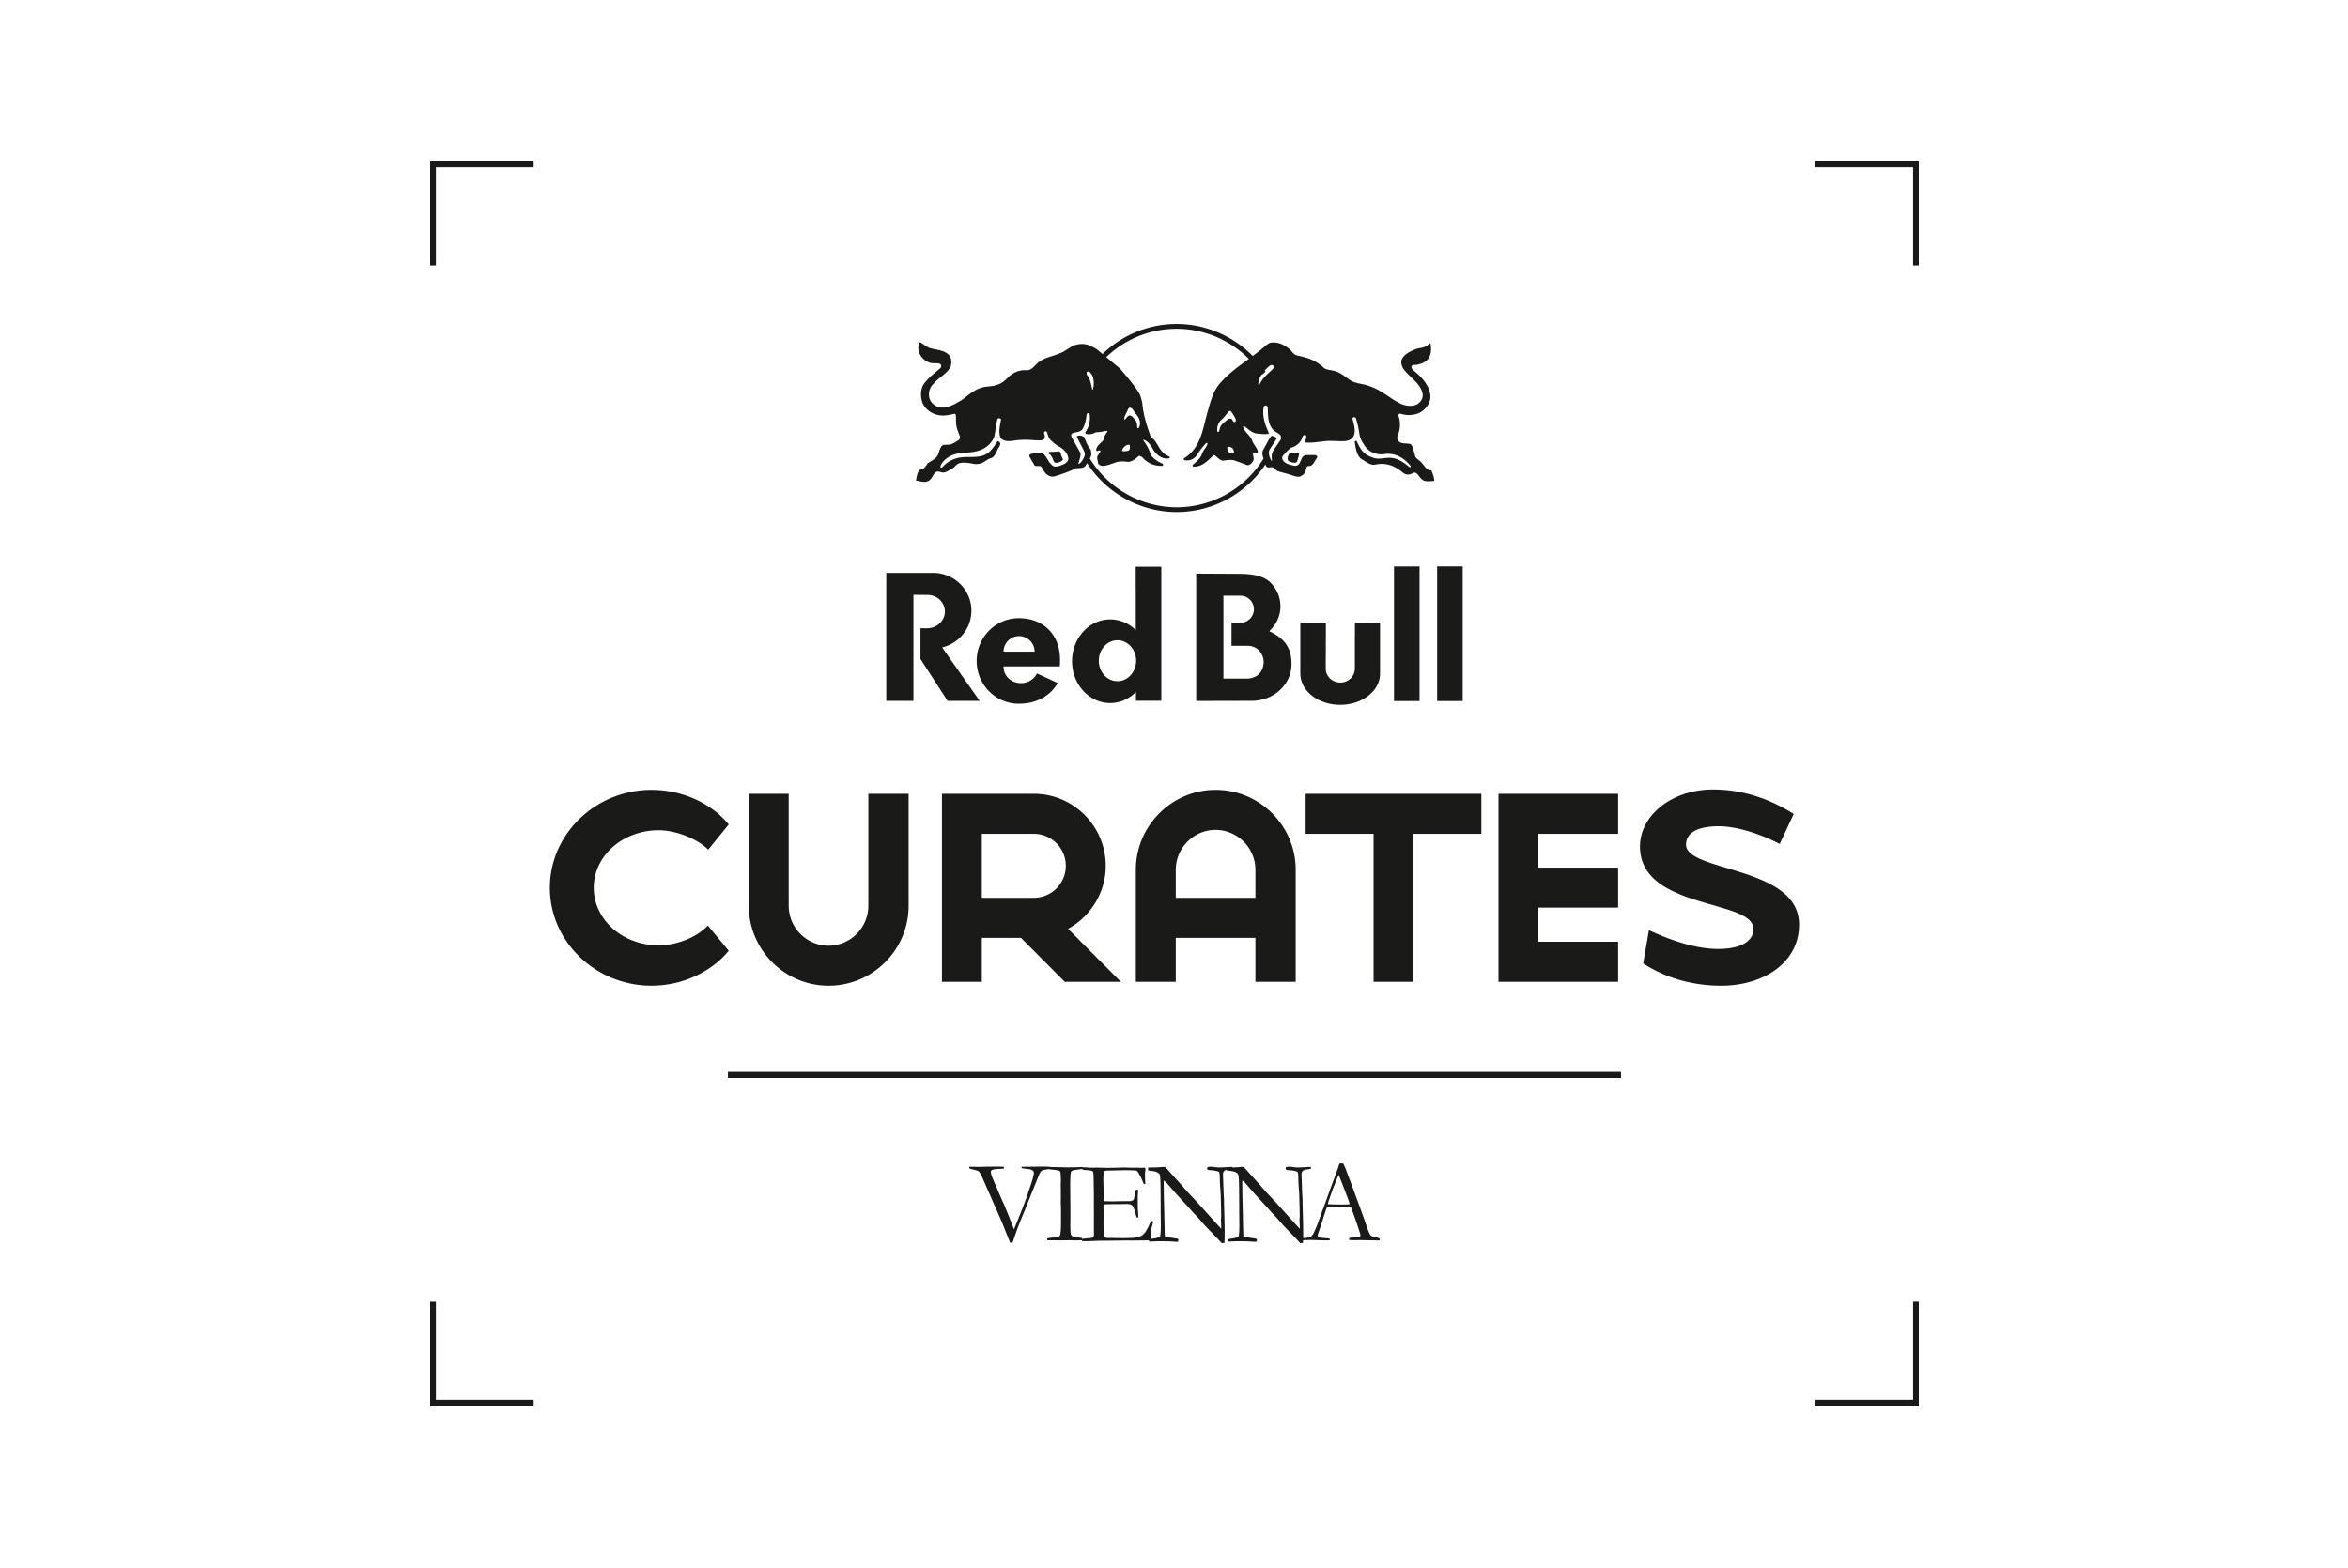 VALENCE Curates 16